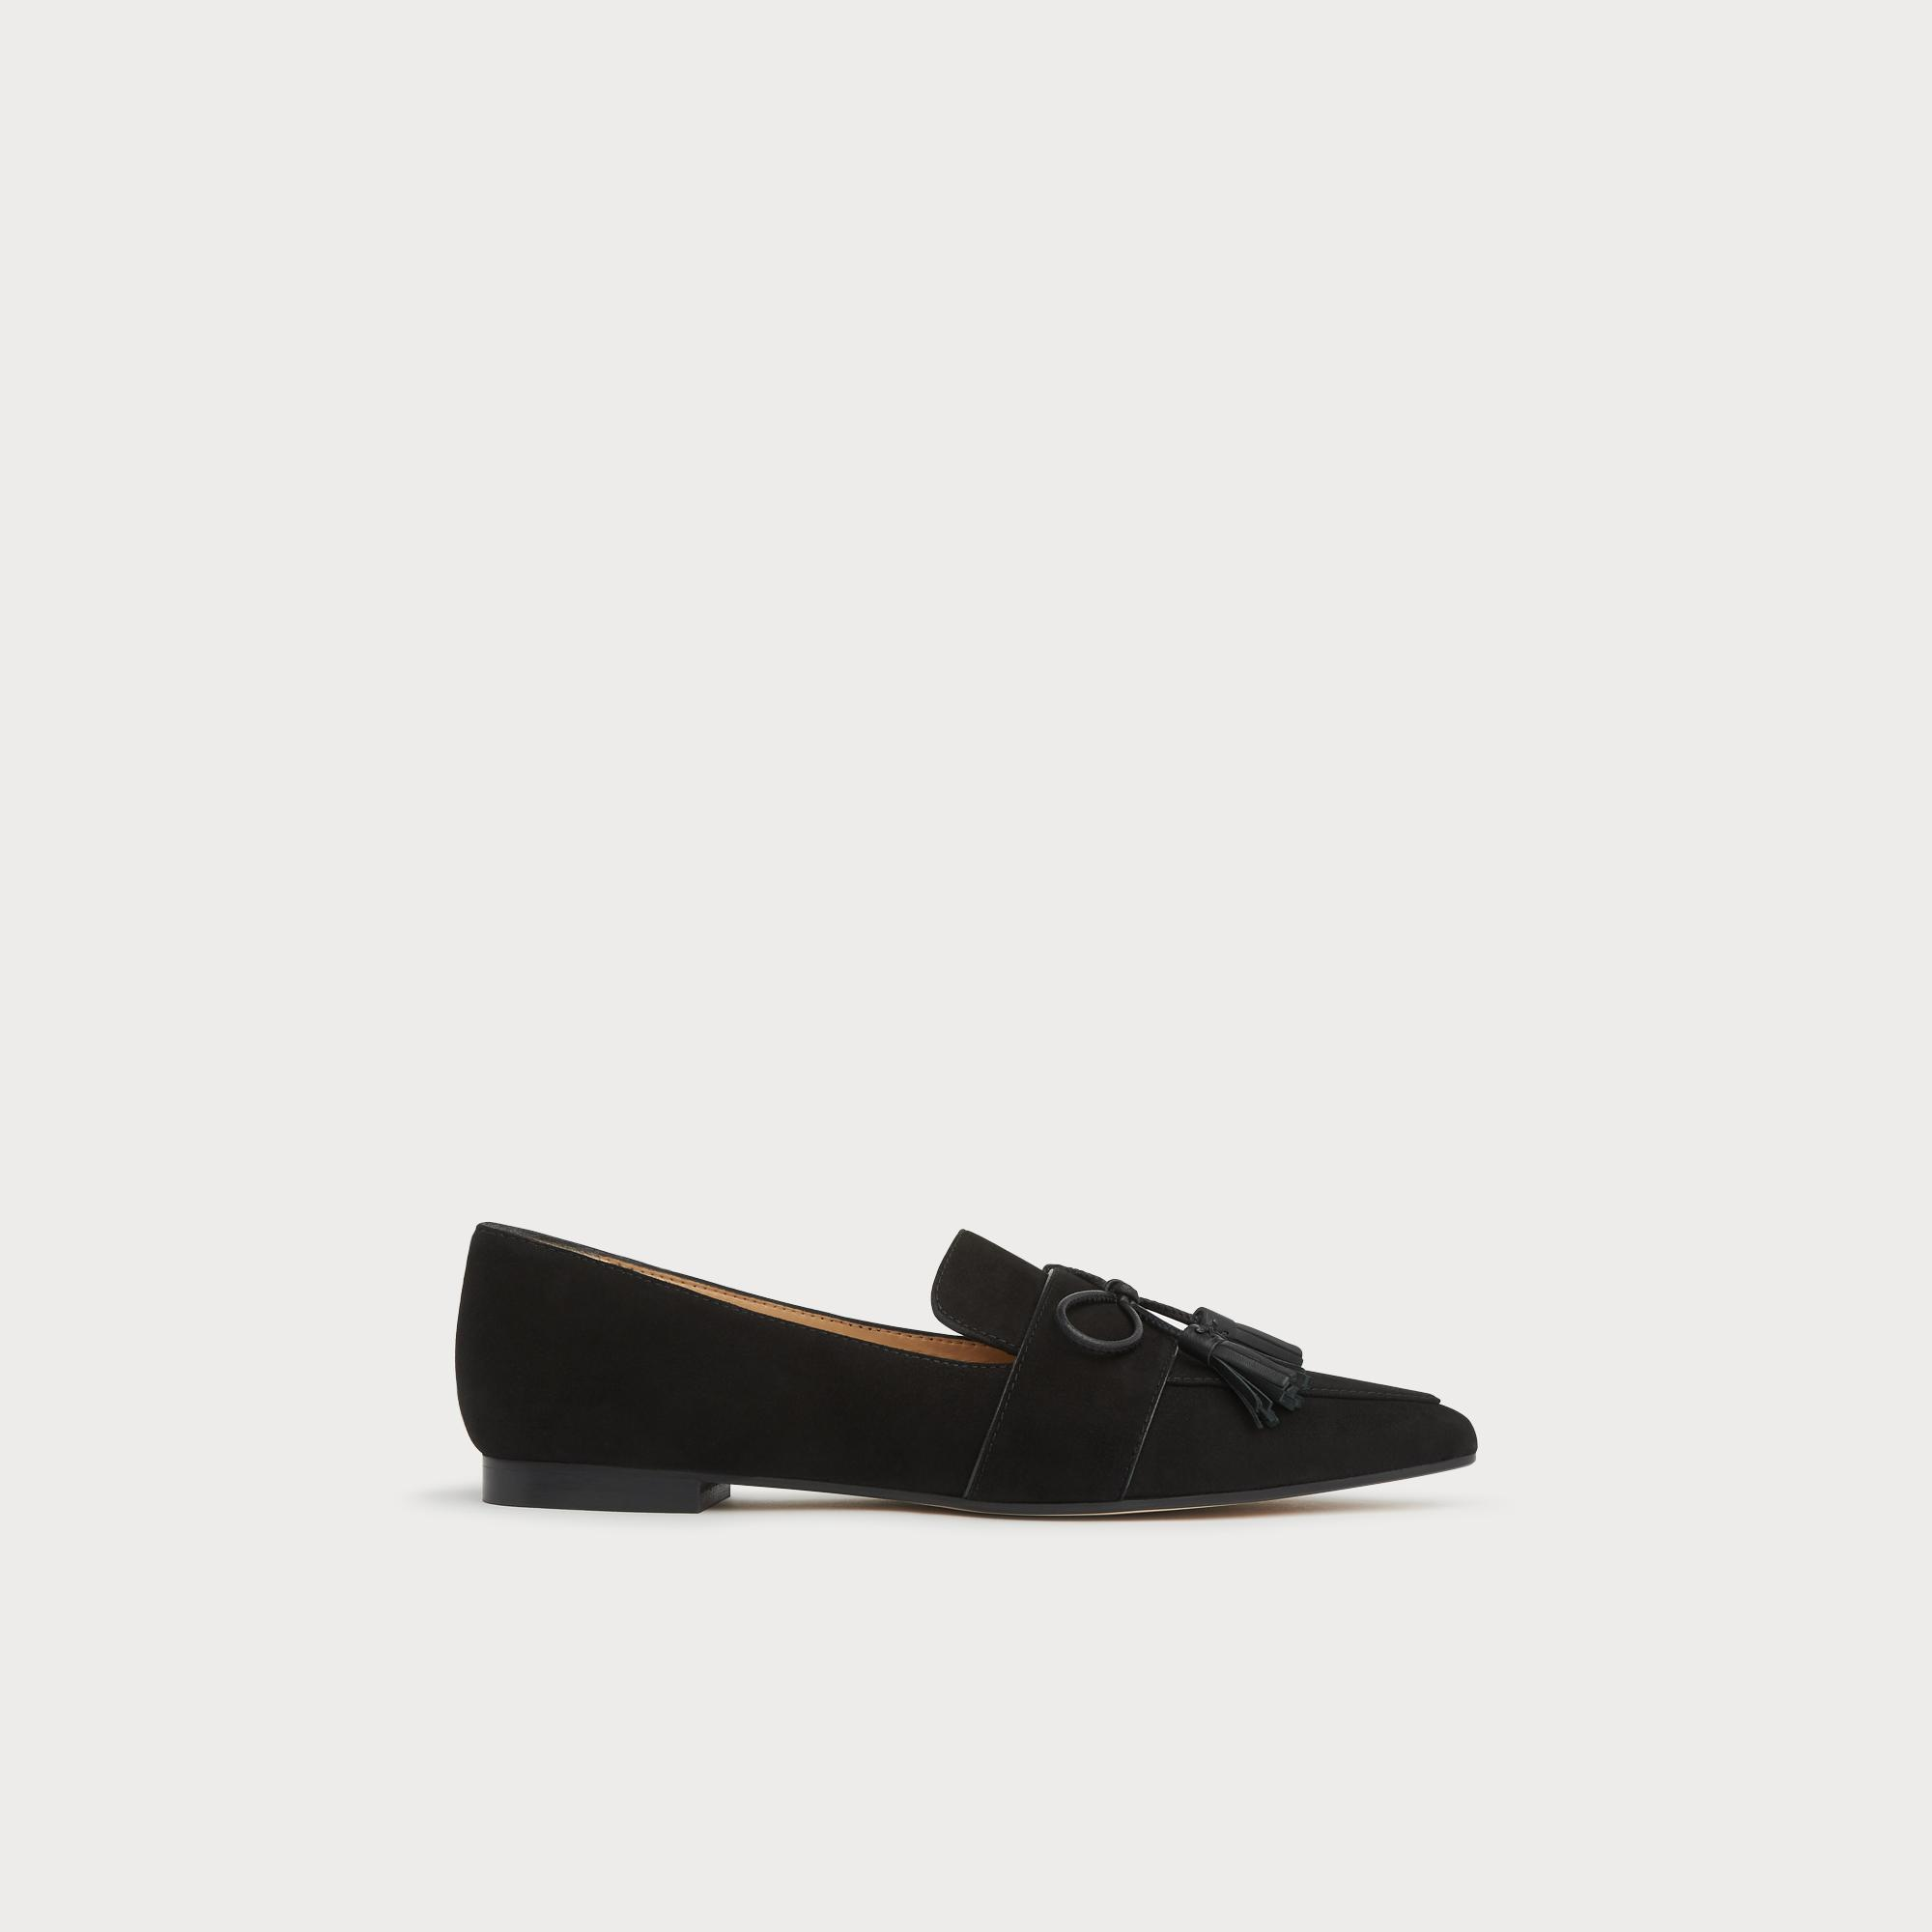 0cce0fa2f Celina Black Suede Tassel Loafers | Shoes | L.K.Bennett